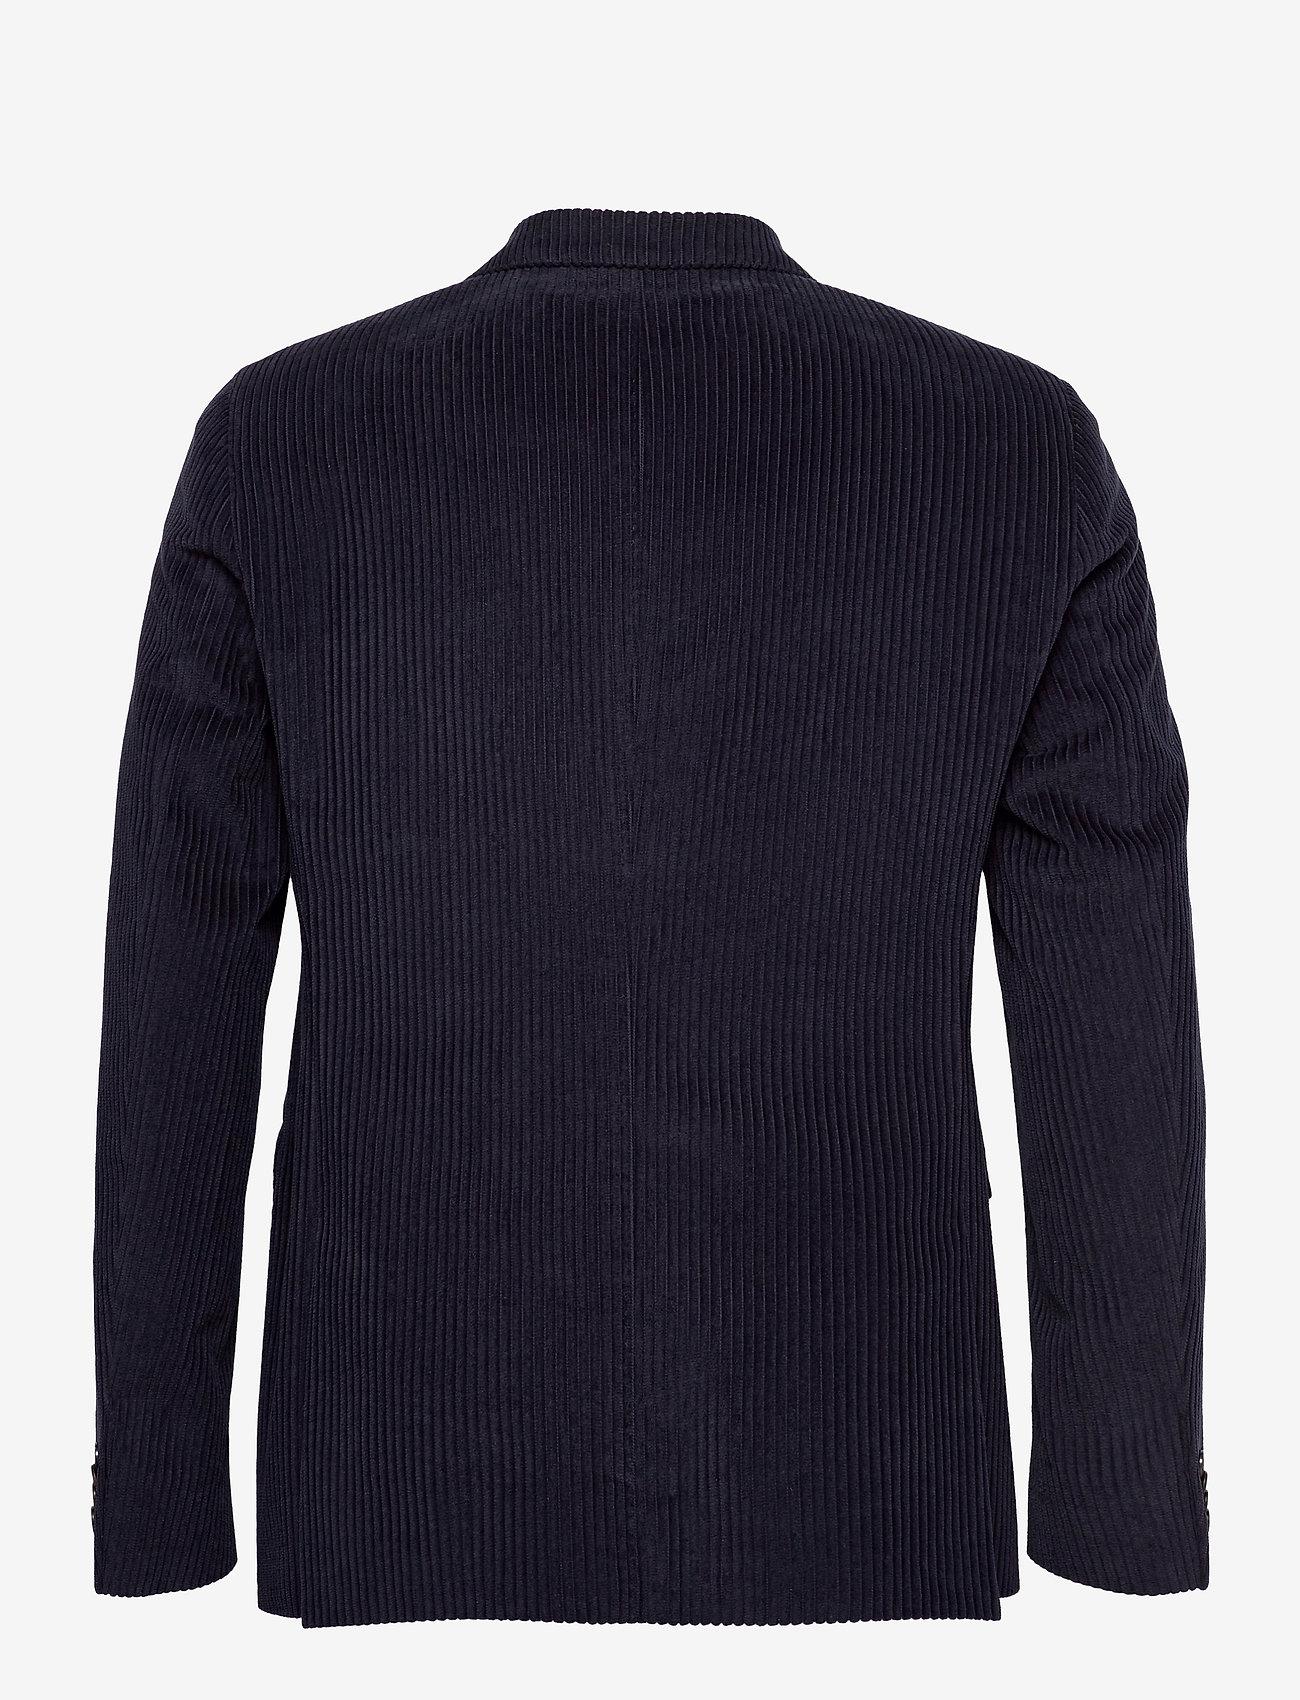 SAND - 1663 - Star DB Normal - single breasted blazers - dark blue/navy - 1